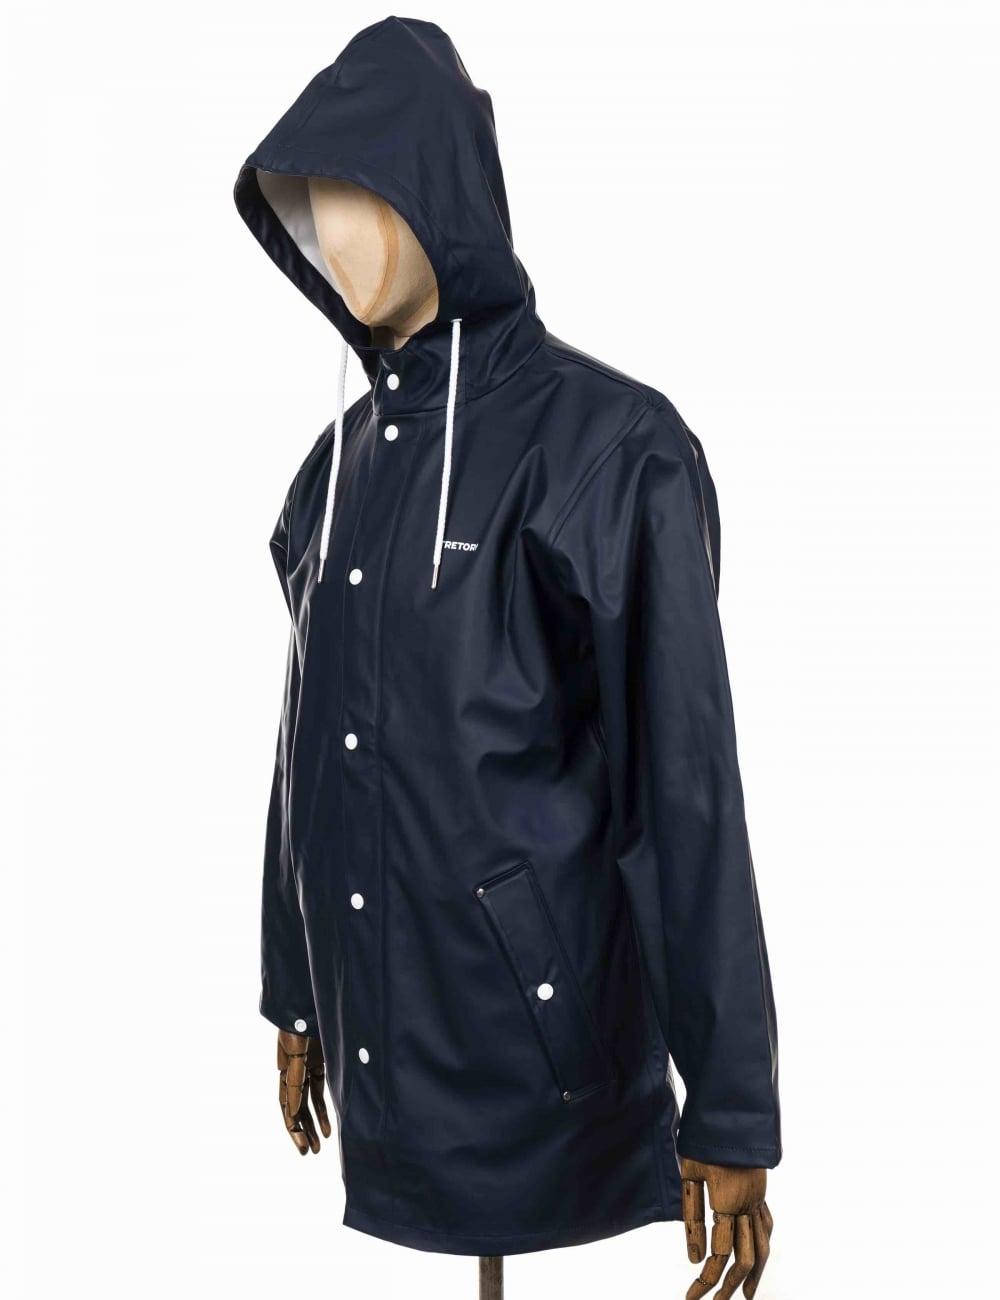 adb1f4e508226 Tretorn Wings Rain Coat - Navy - Clothing from Fat Buddha Store UK